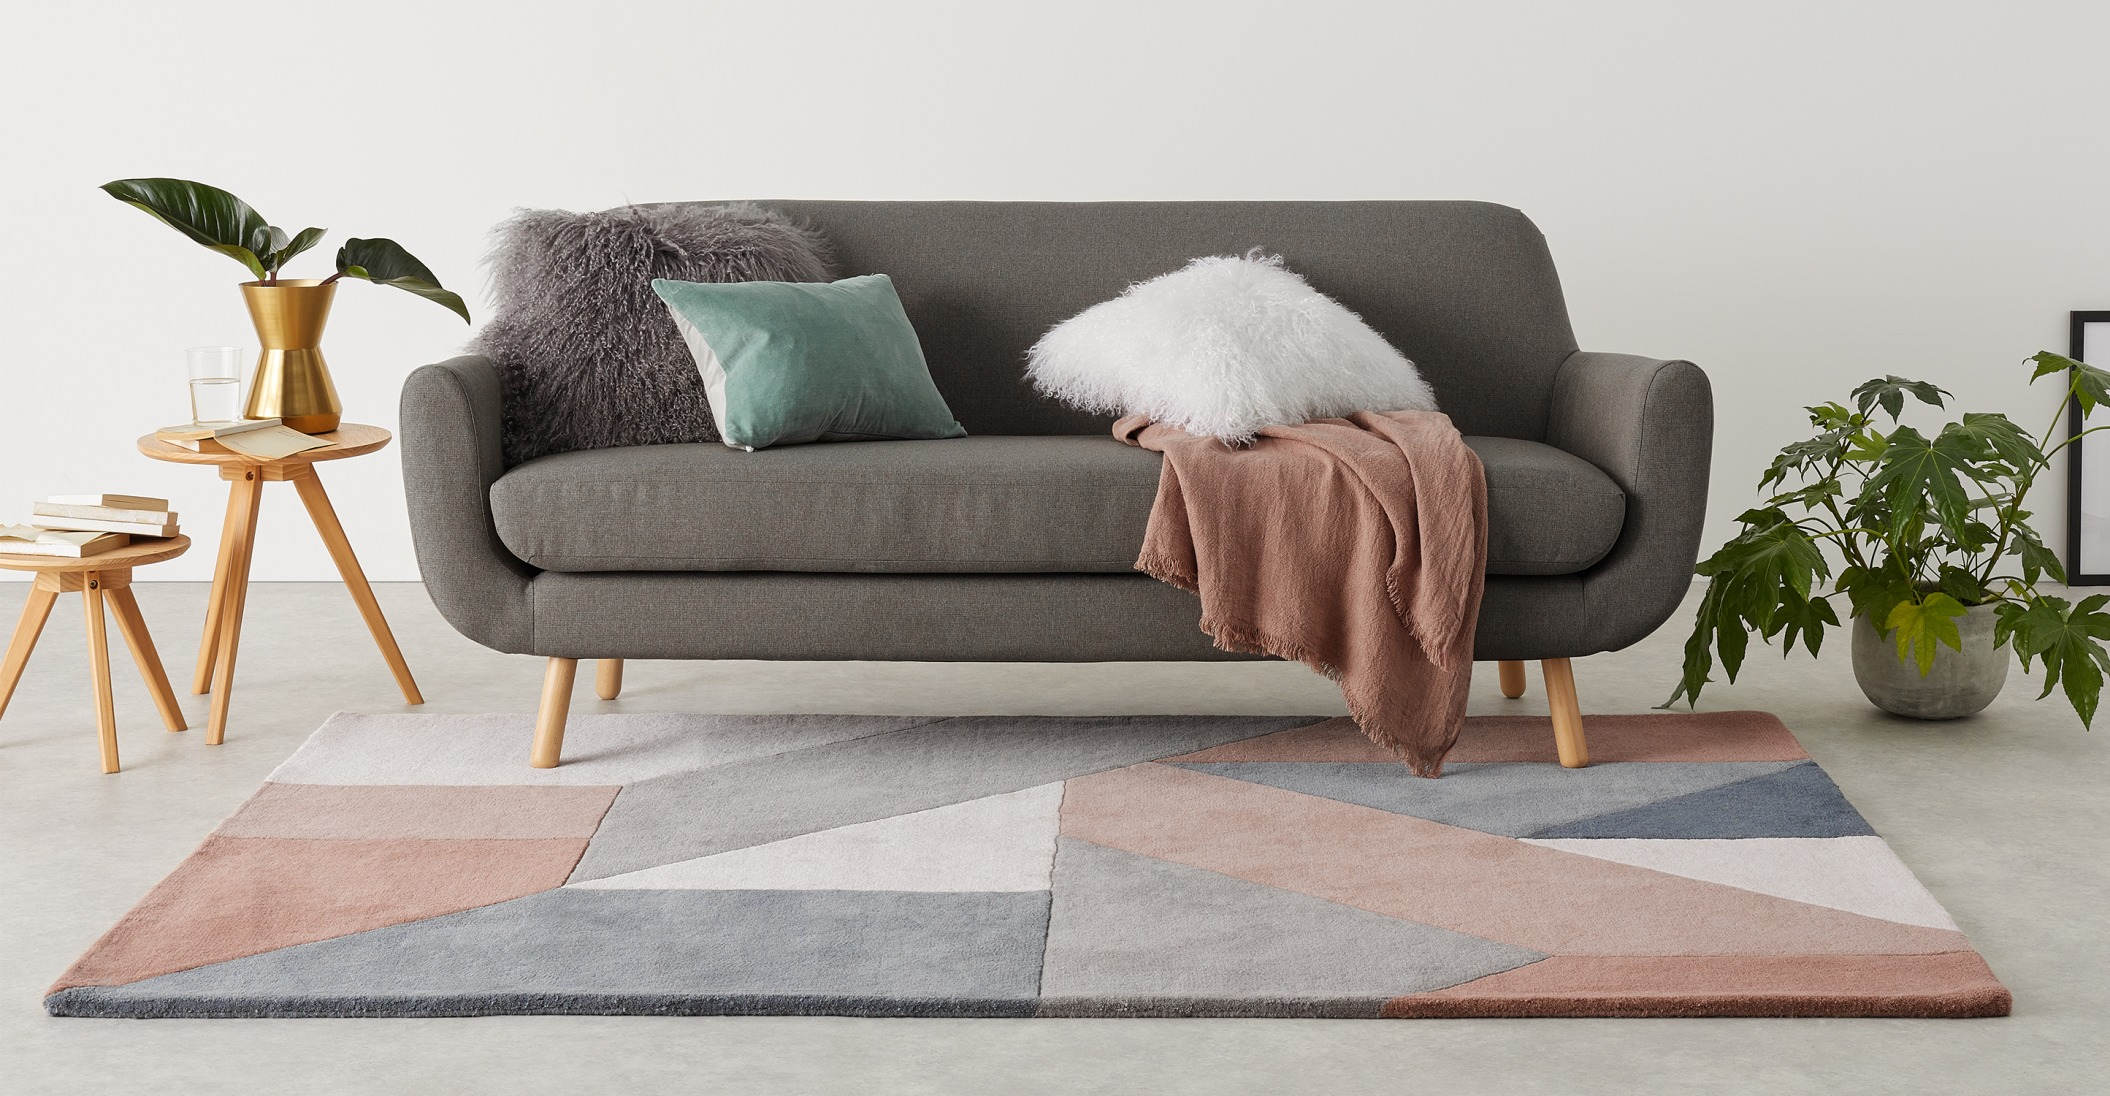 Alfombra grande de lana anudada a mano con dibujo geométrico Holden, 160 x 230 cm, rosa neutro